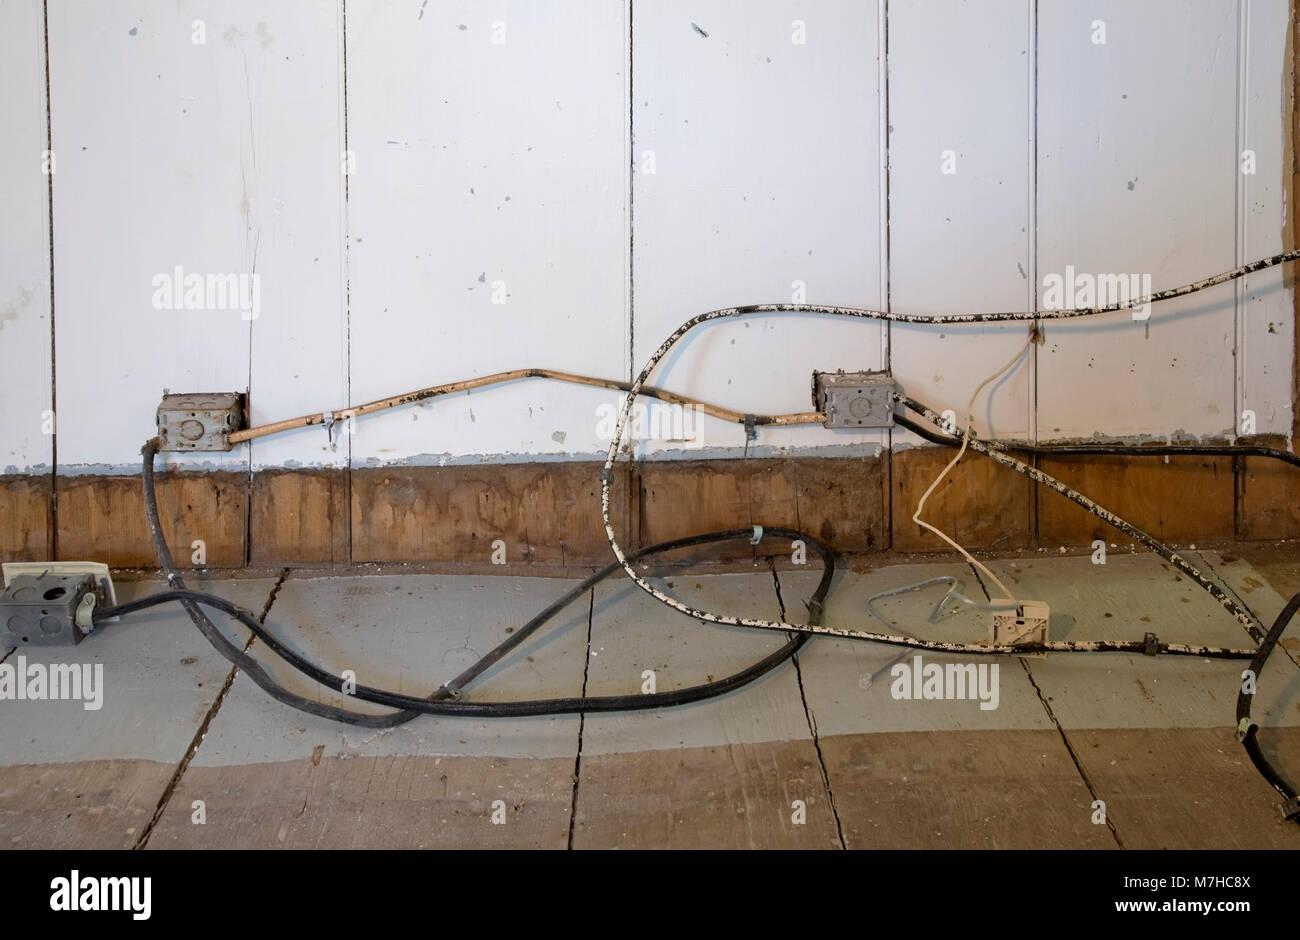 House Wiring Stockfotos & House Wiring Bilder - Alamy